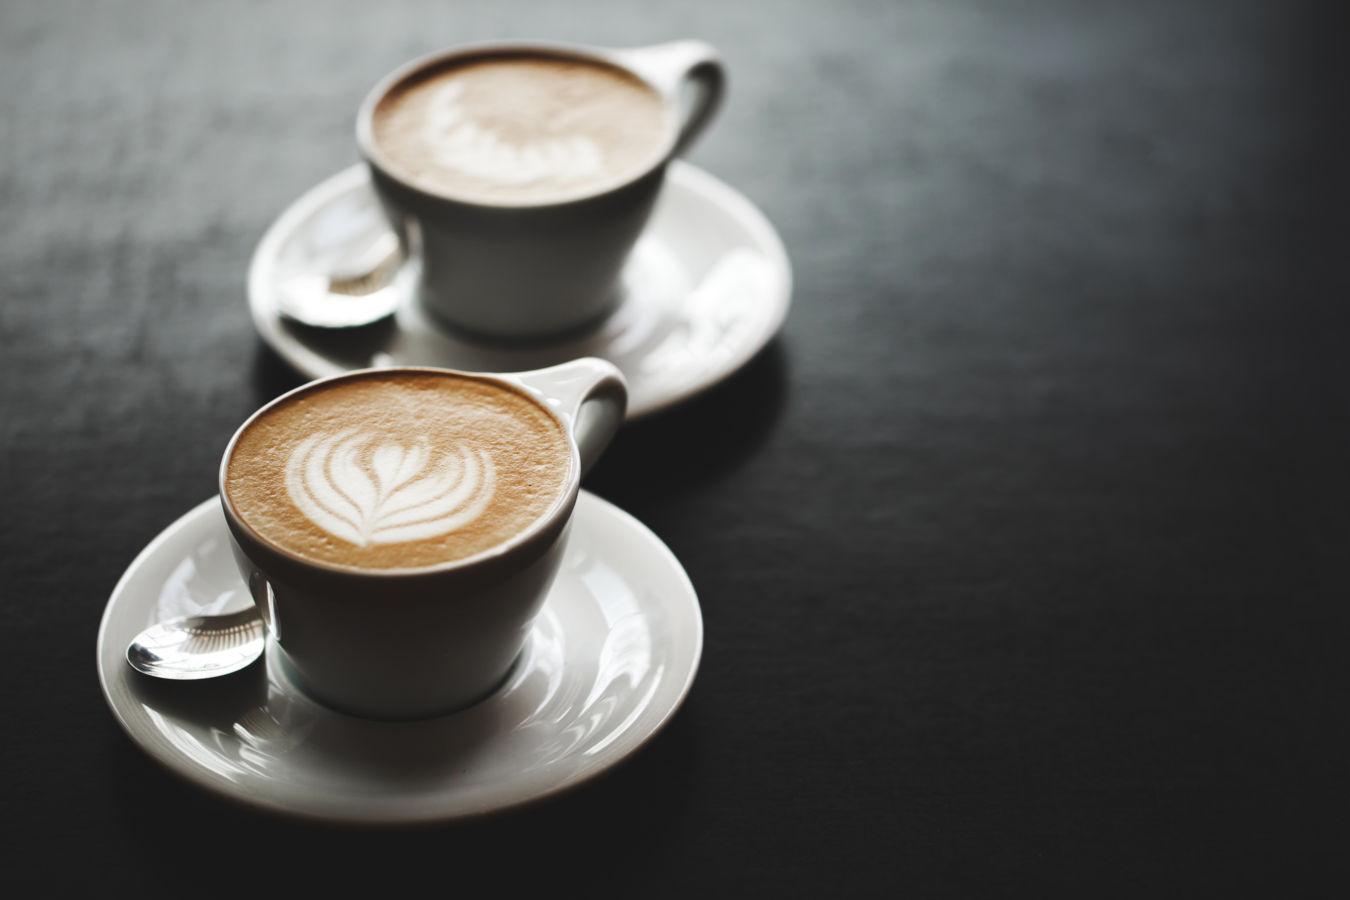 Akademie kávy díl 5: Cappuccino